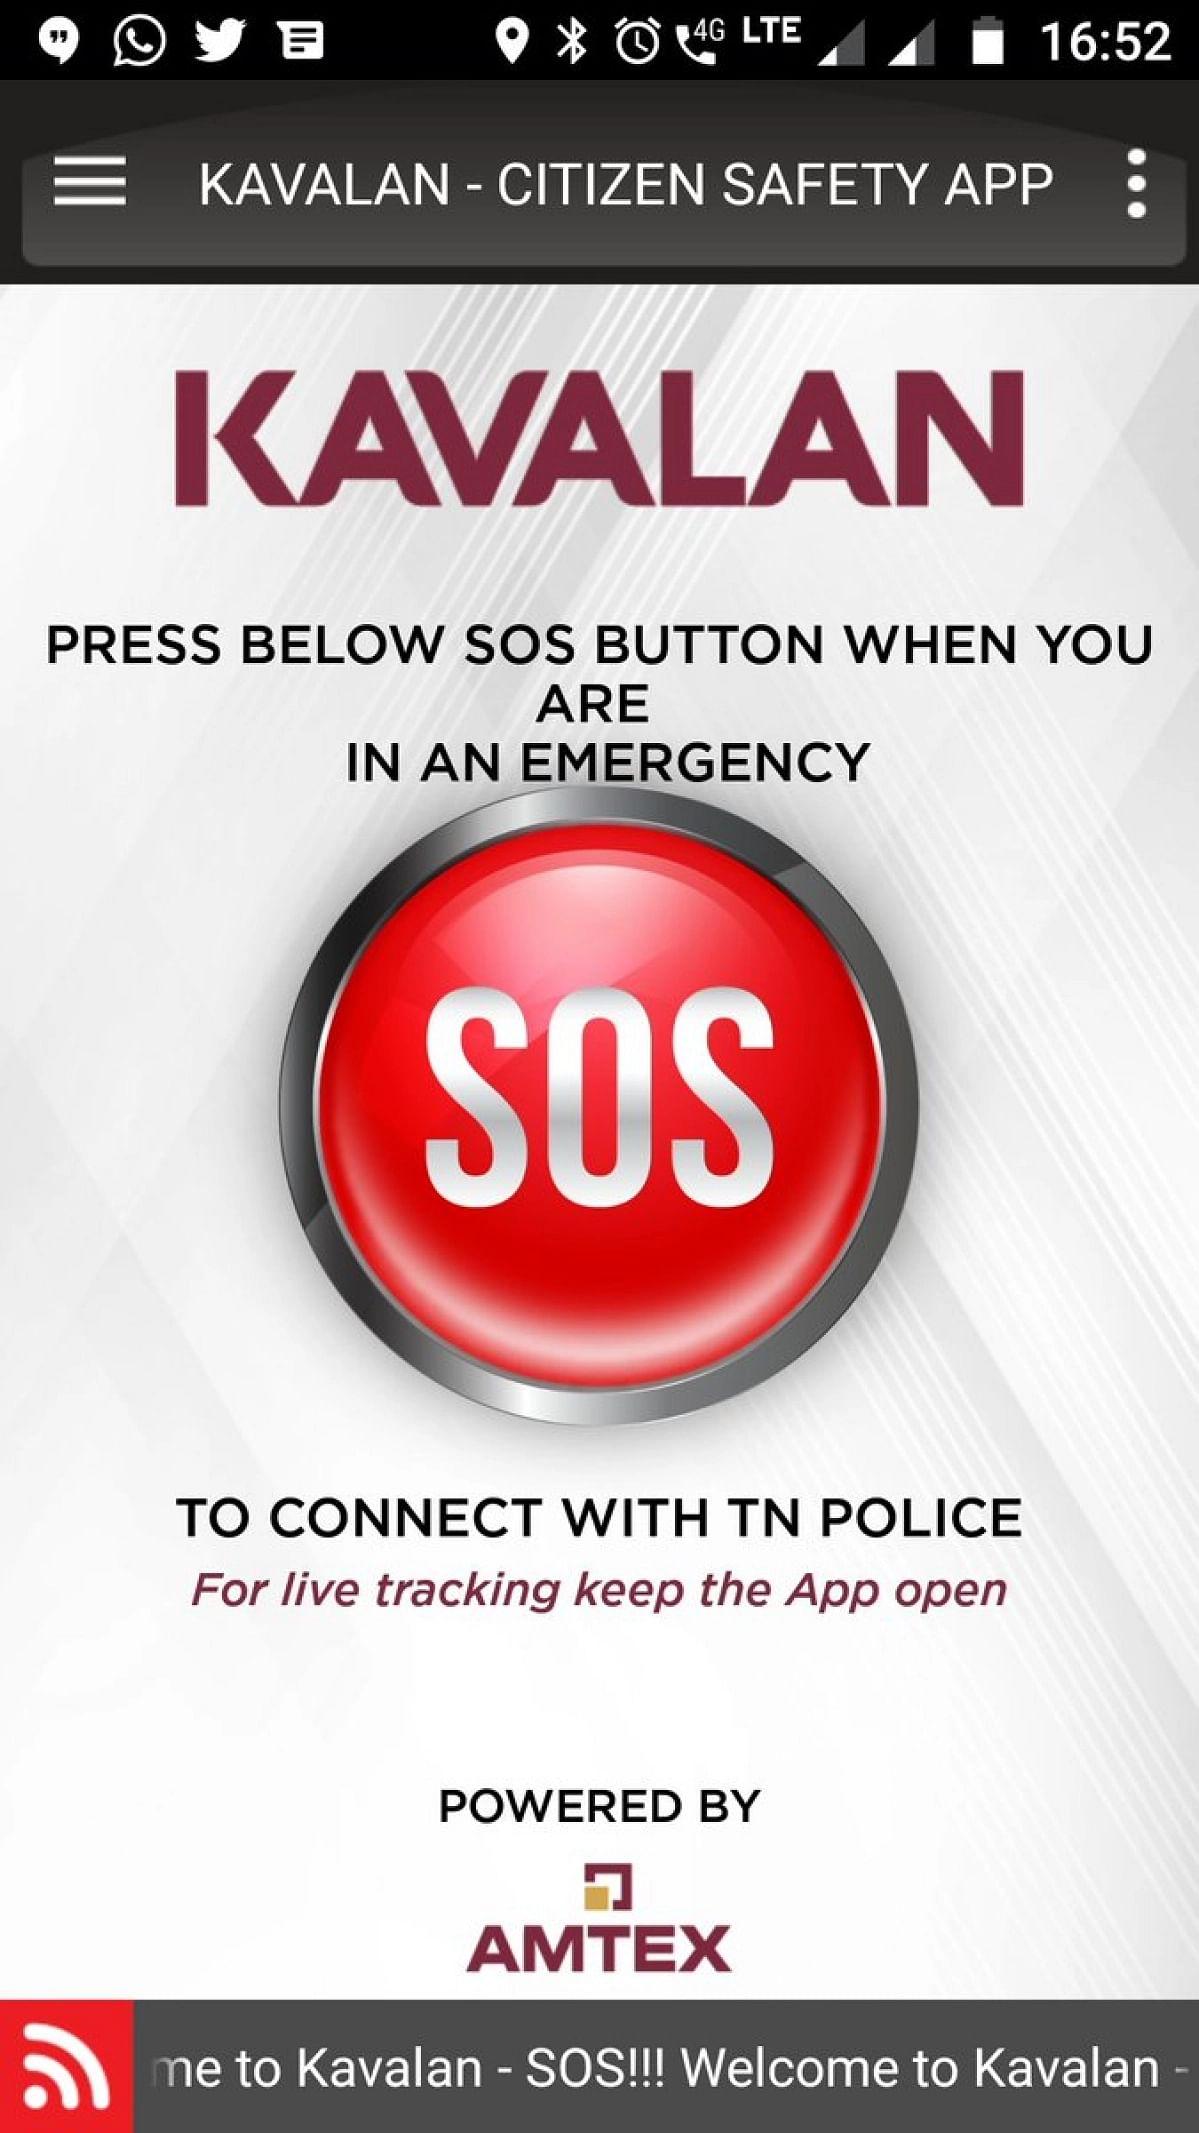 Kavalan - Citizen Safety App